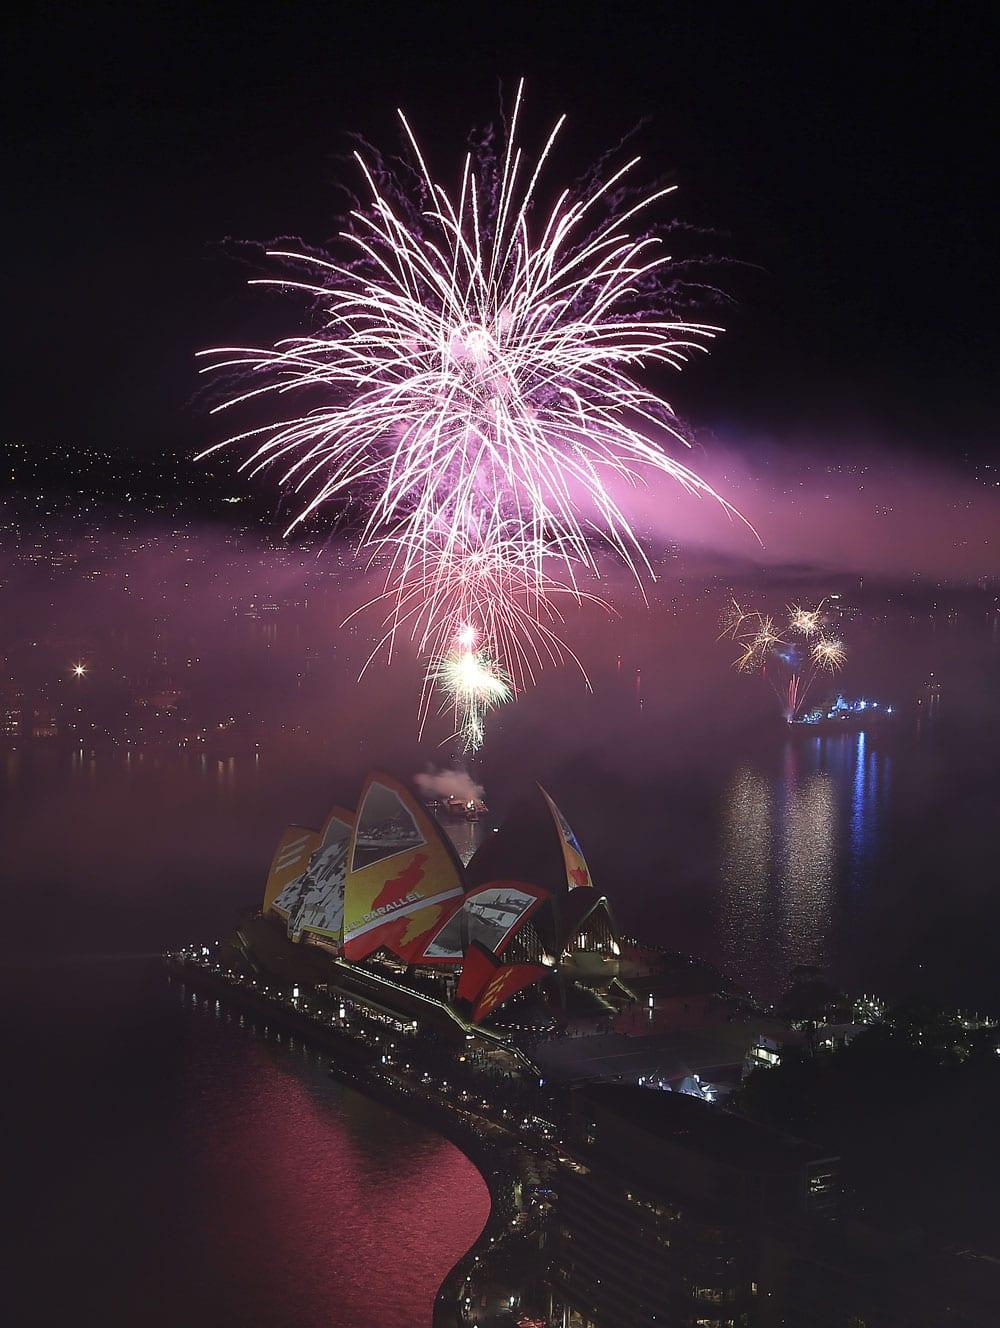 Fireworks explode over Sydney Harbour in Australia, during the International Fleet review celebrations.